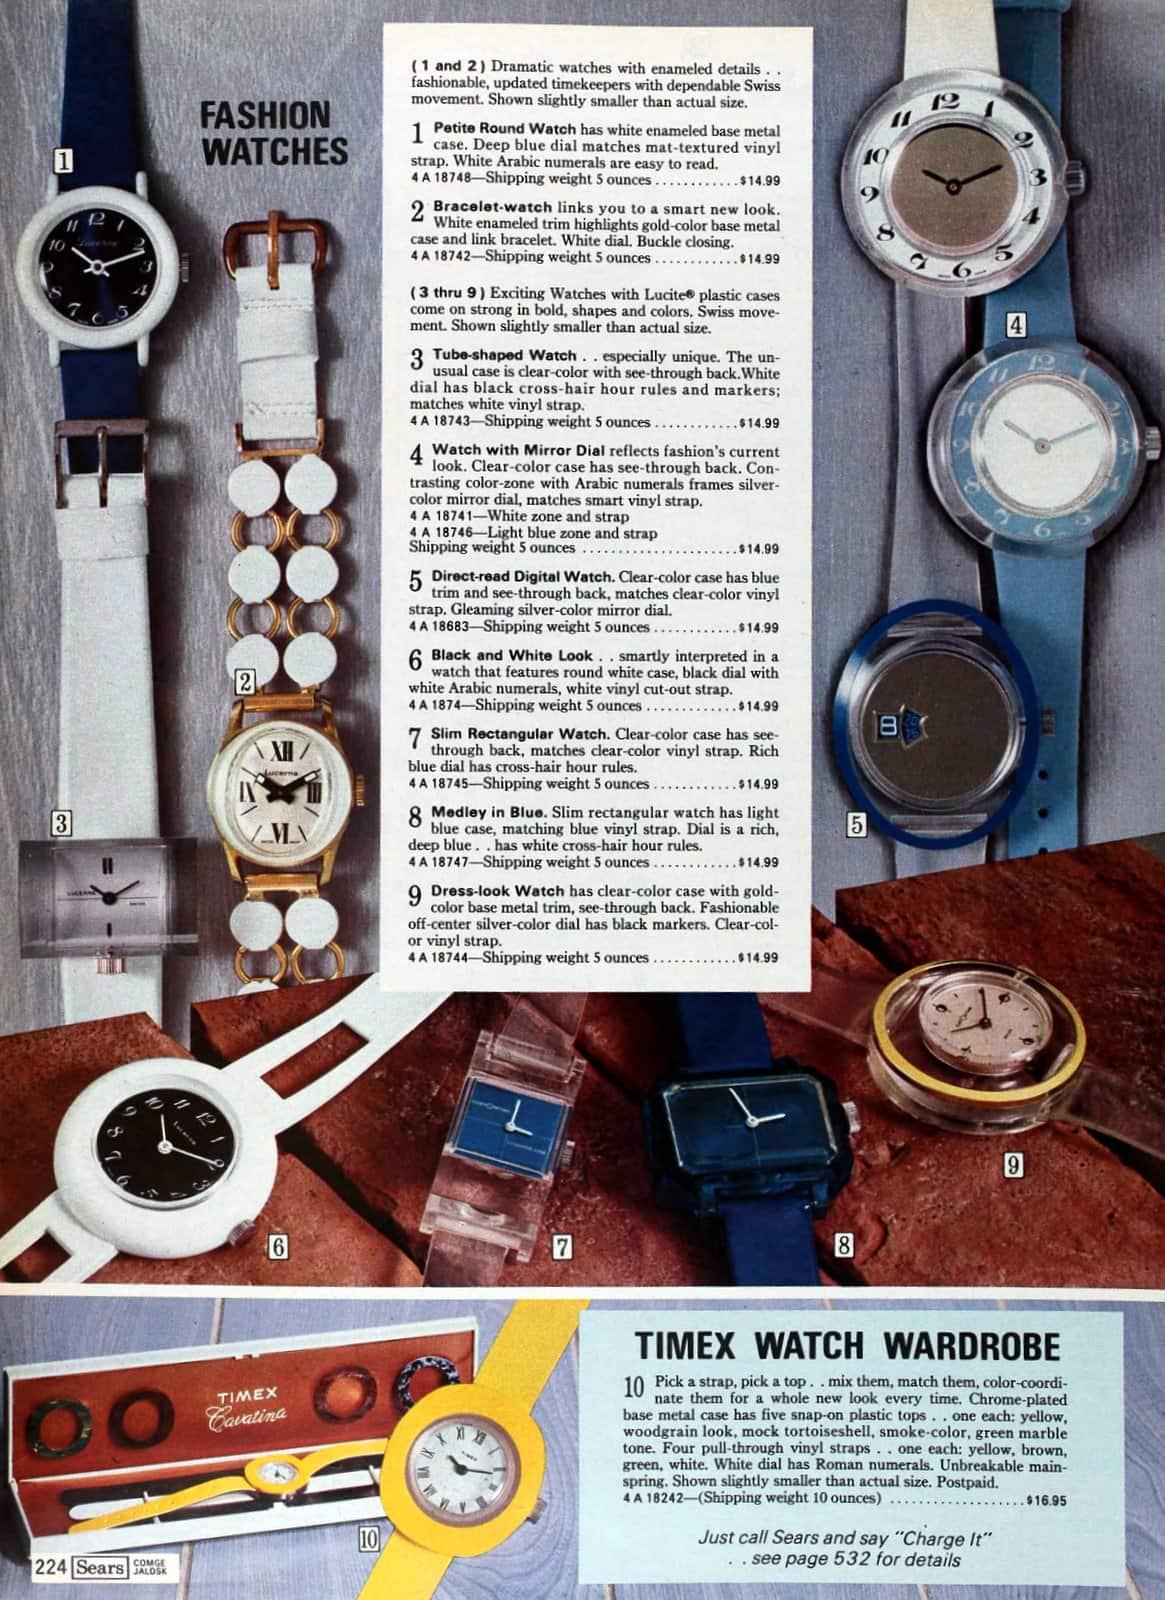 Vintage fashion watches (1974)